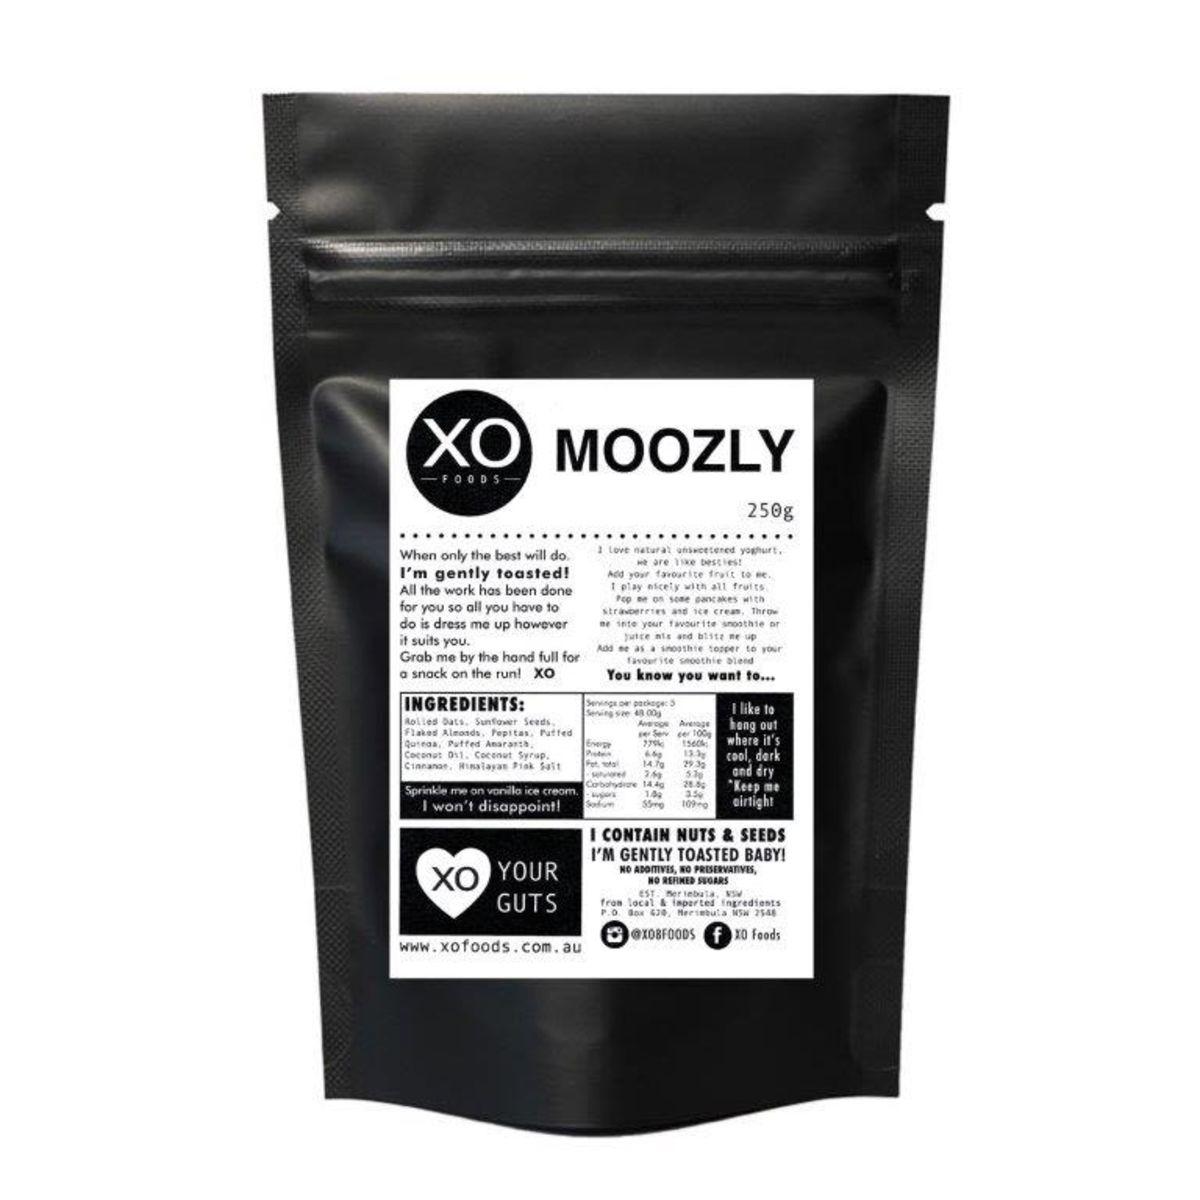 XO Foods - Moozly